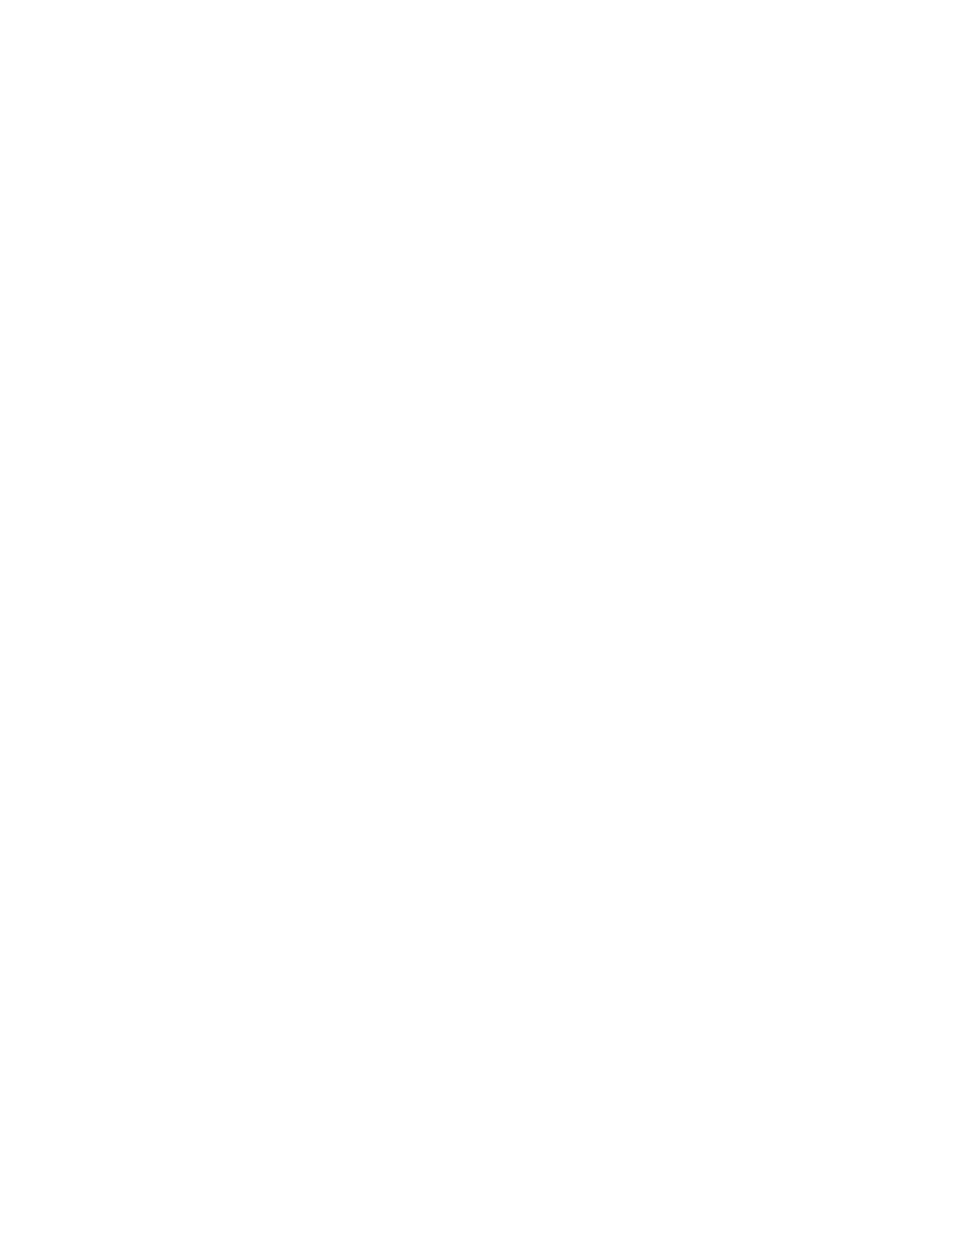 York DM 300 User Manual | Page 8 / 40 | Also for: DM 240, DM 180